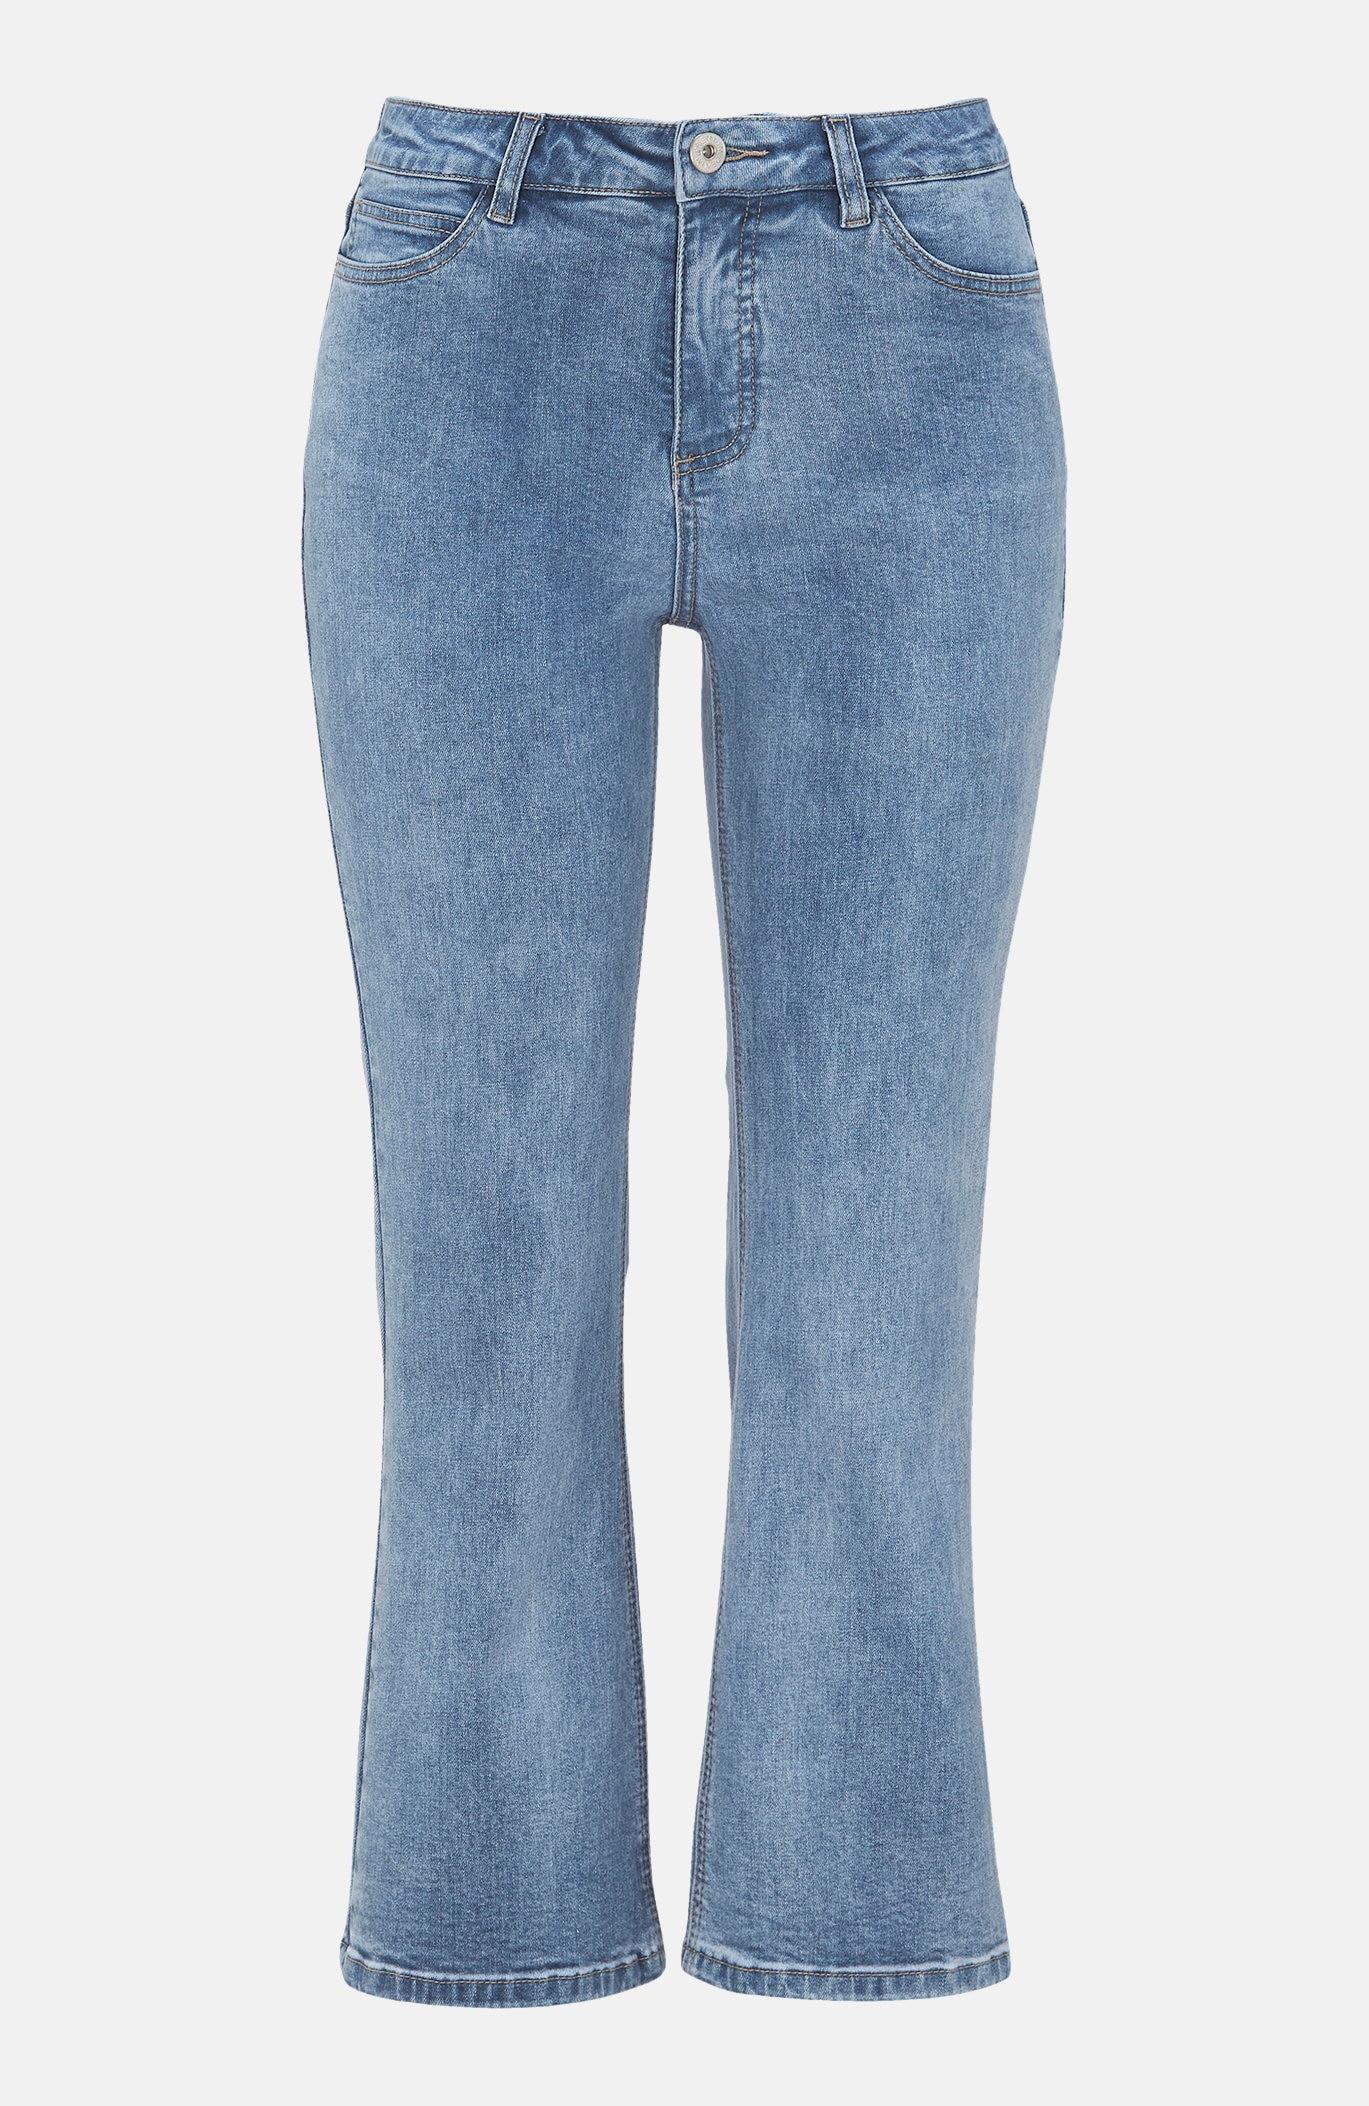 Kickflare jeans